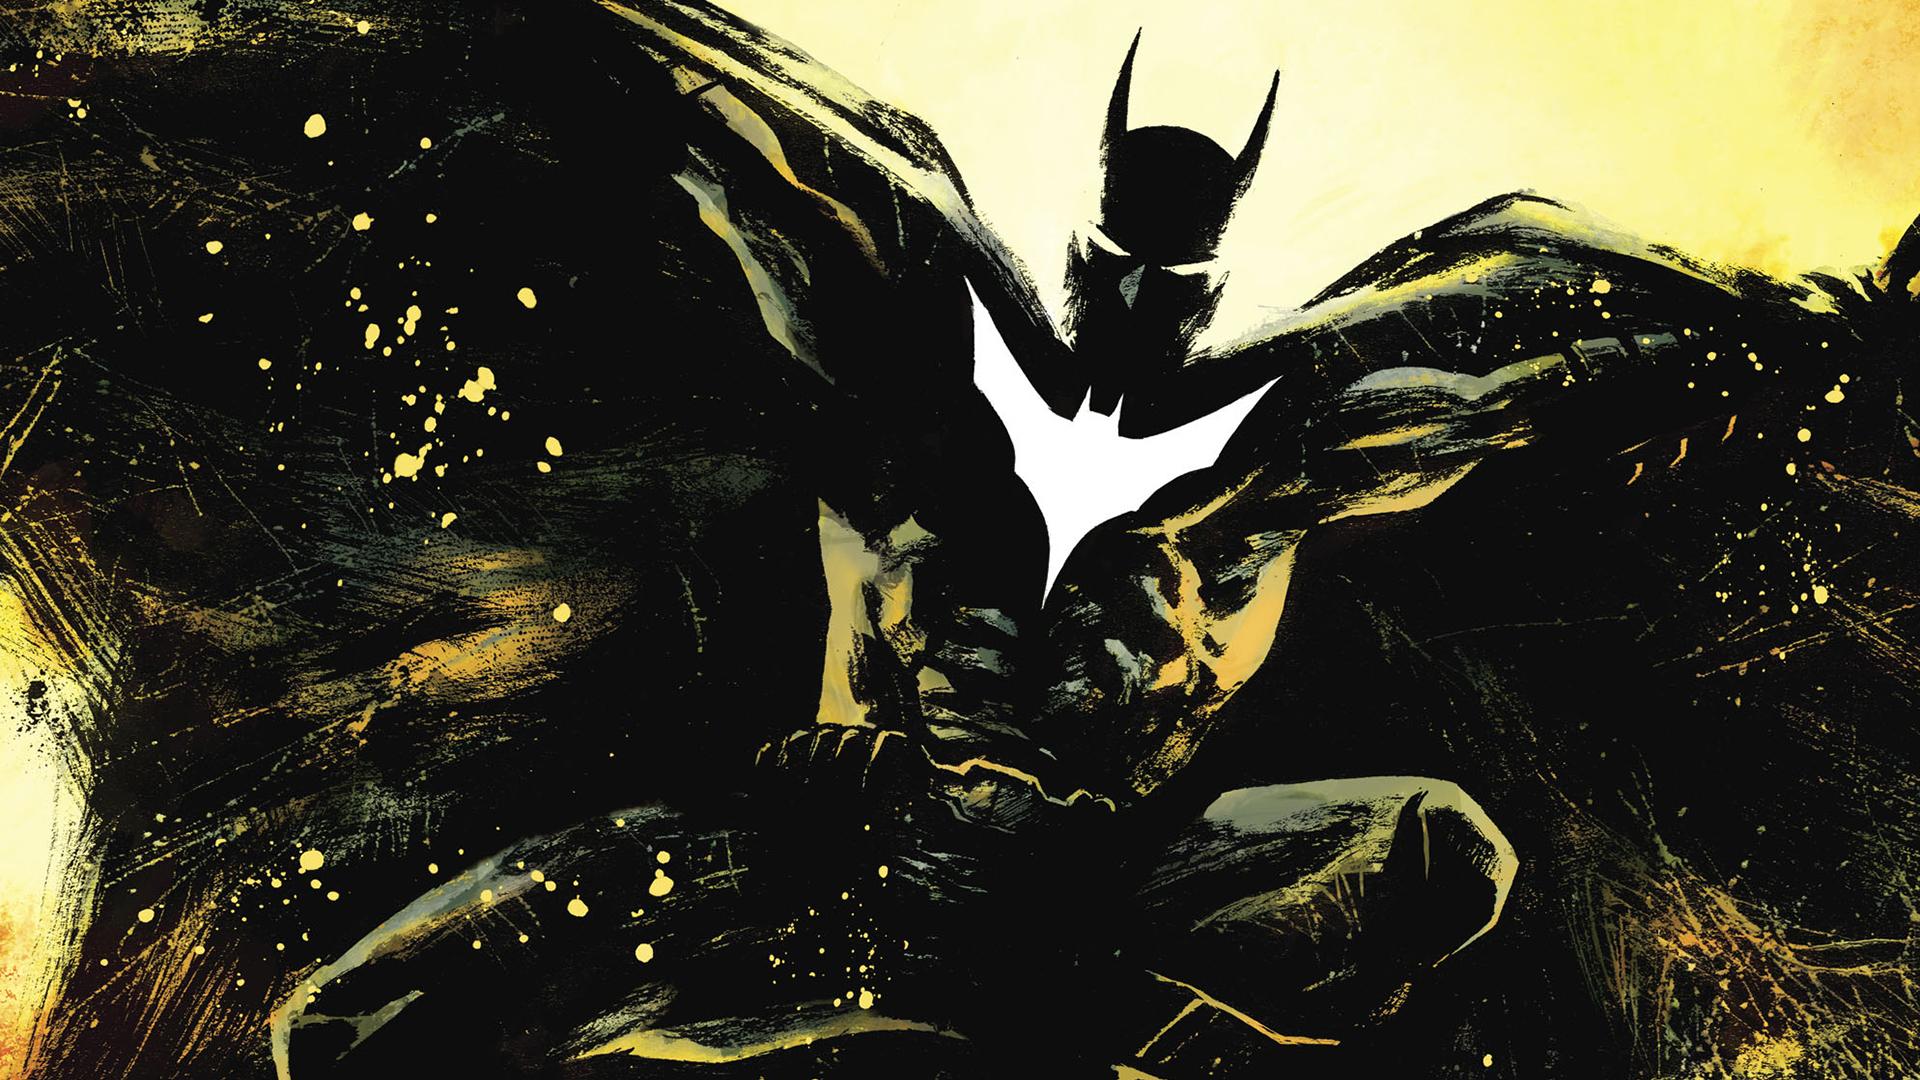 batman amazing dc comic art, hd superheroes, 4k wallpapers, images